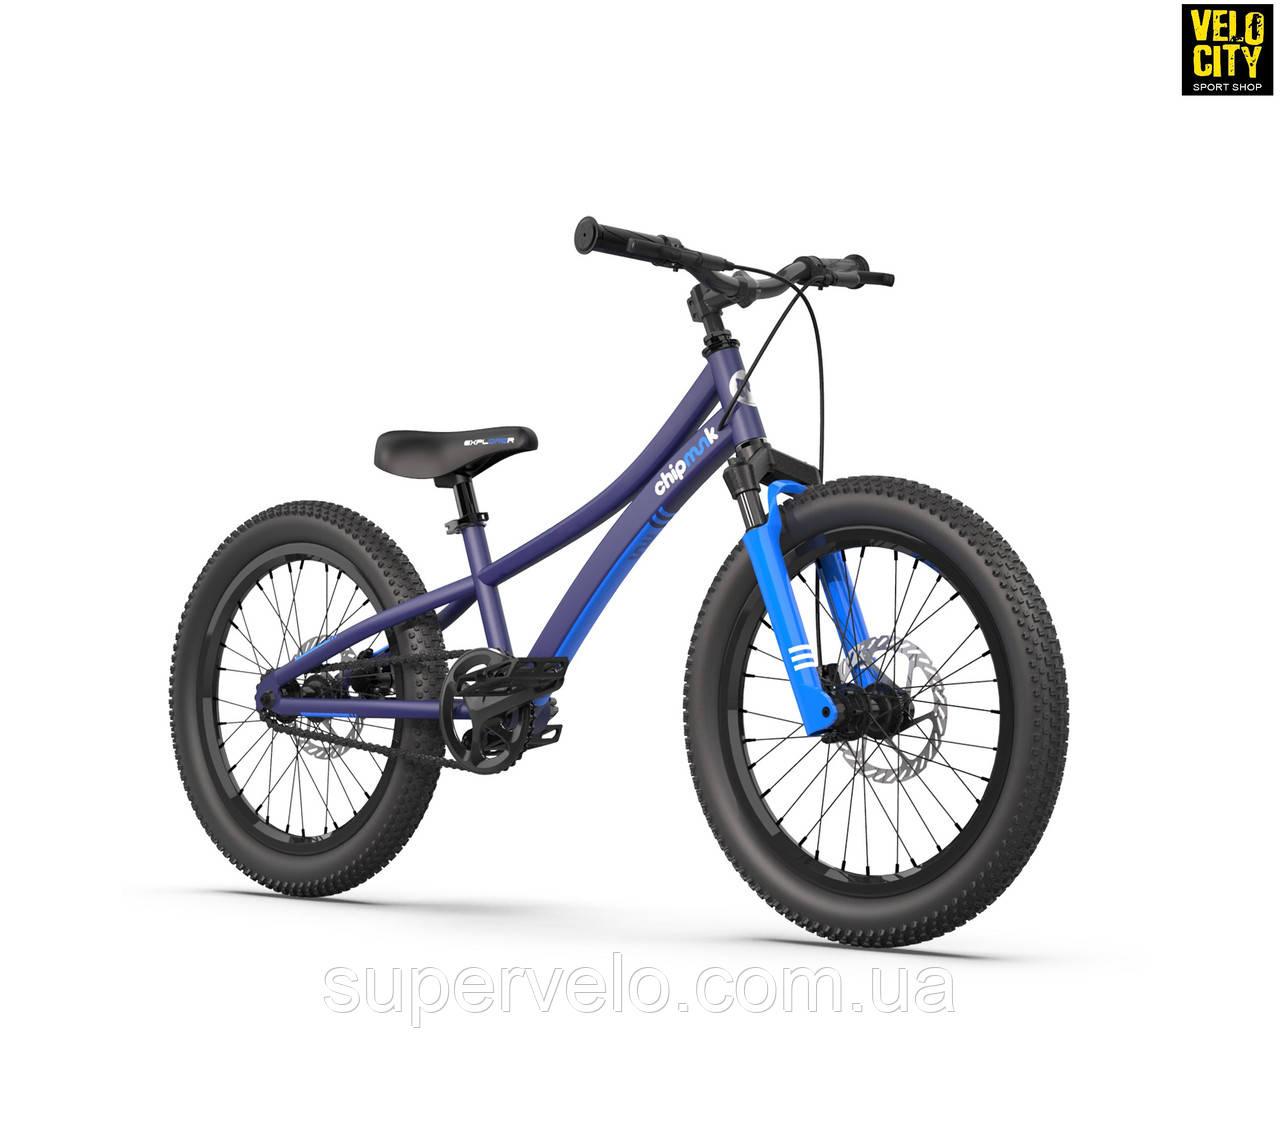 "Велосипед RoyalBaby Chipmunk Explorer 20"" синий, фото 1"